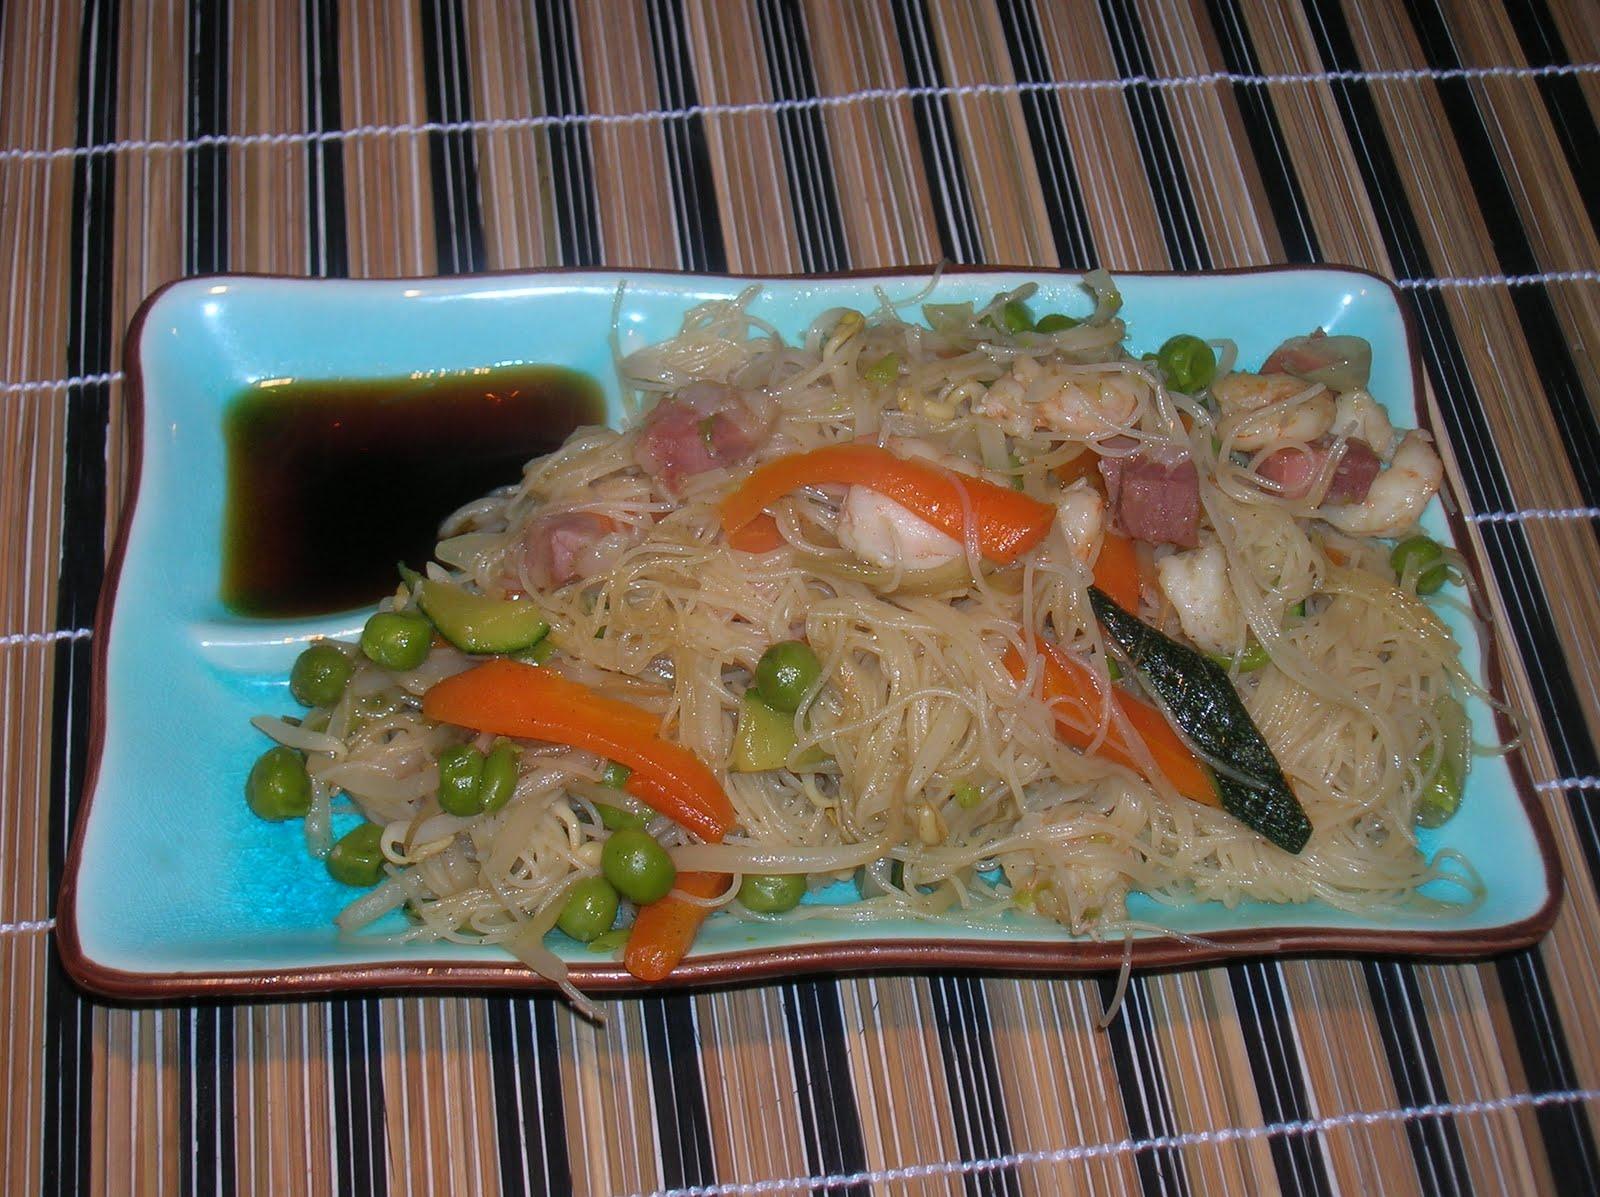 In cucina con Tata: Ricetta cinese: spaghetti di soia con gamberi ...